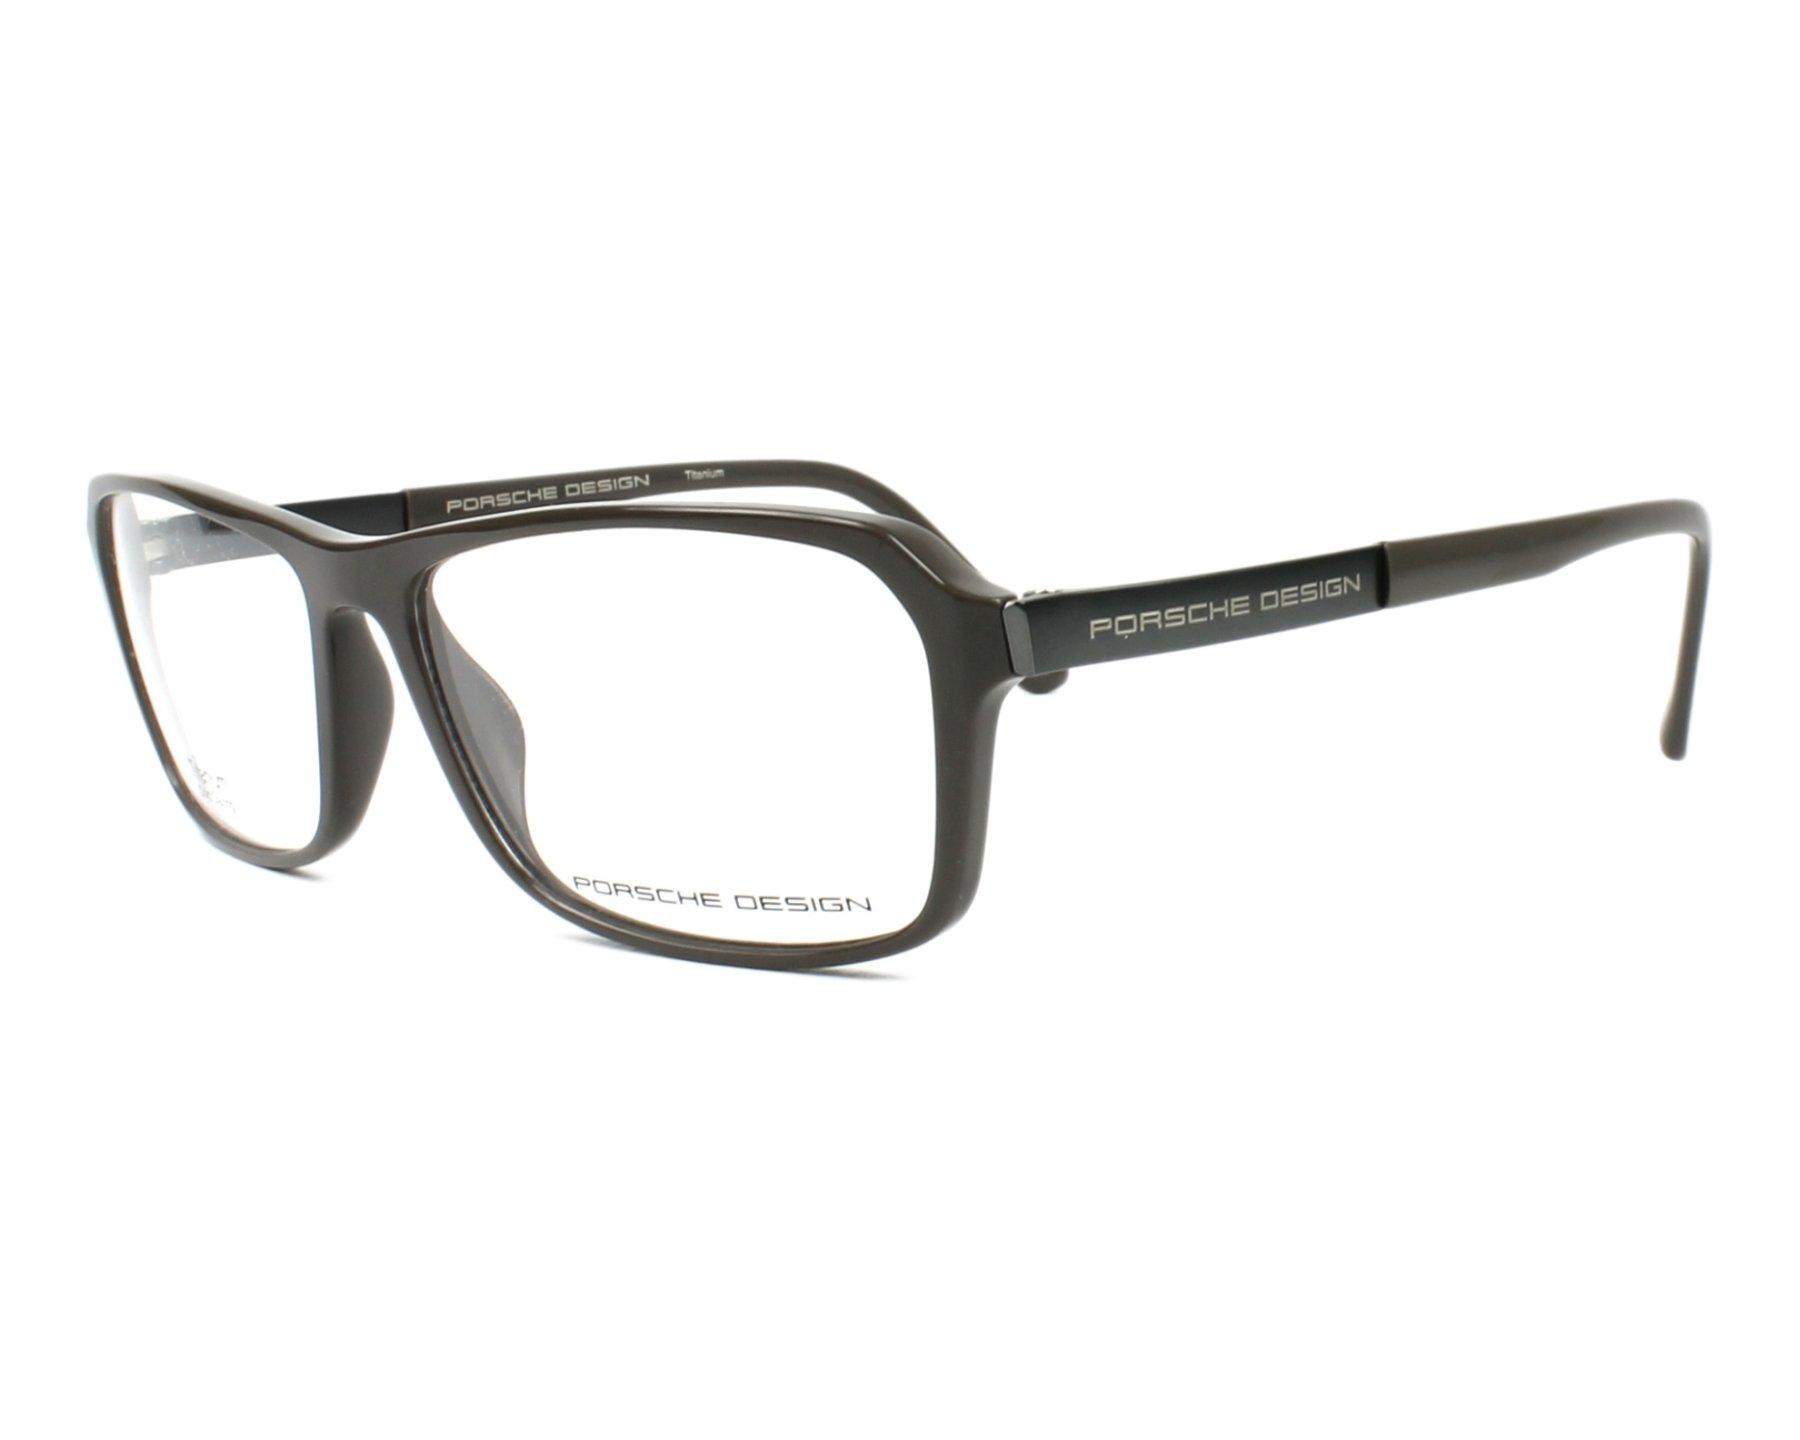 519299a2b59 eyeglasses Porsche Design P-8267 A 55-14 Grey Gun profile view